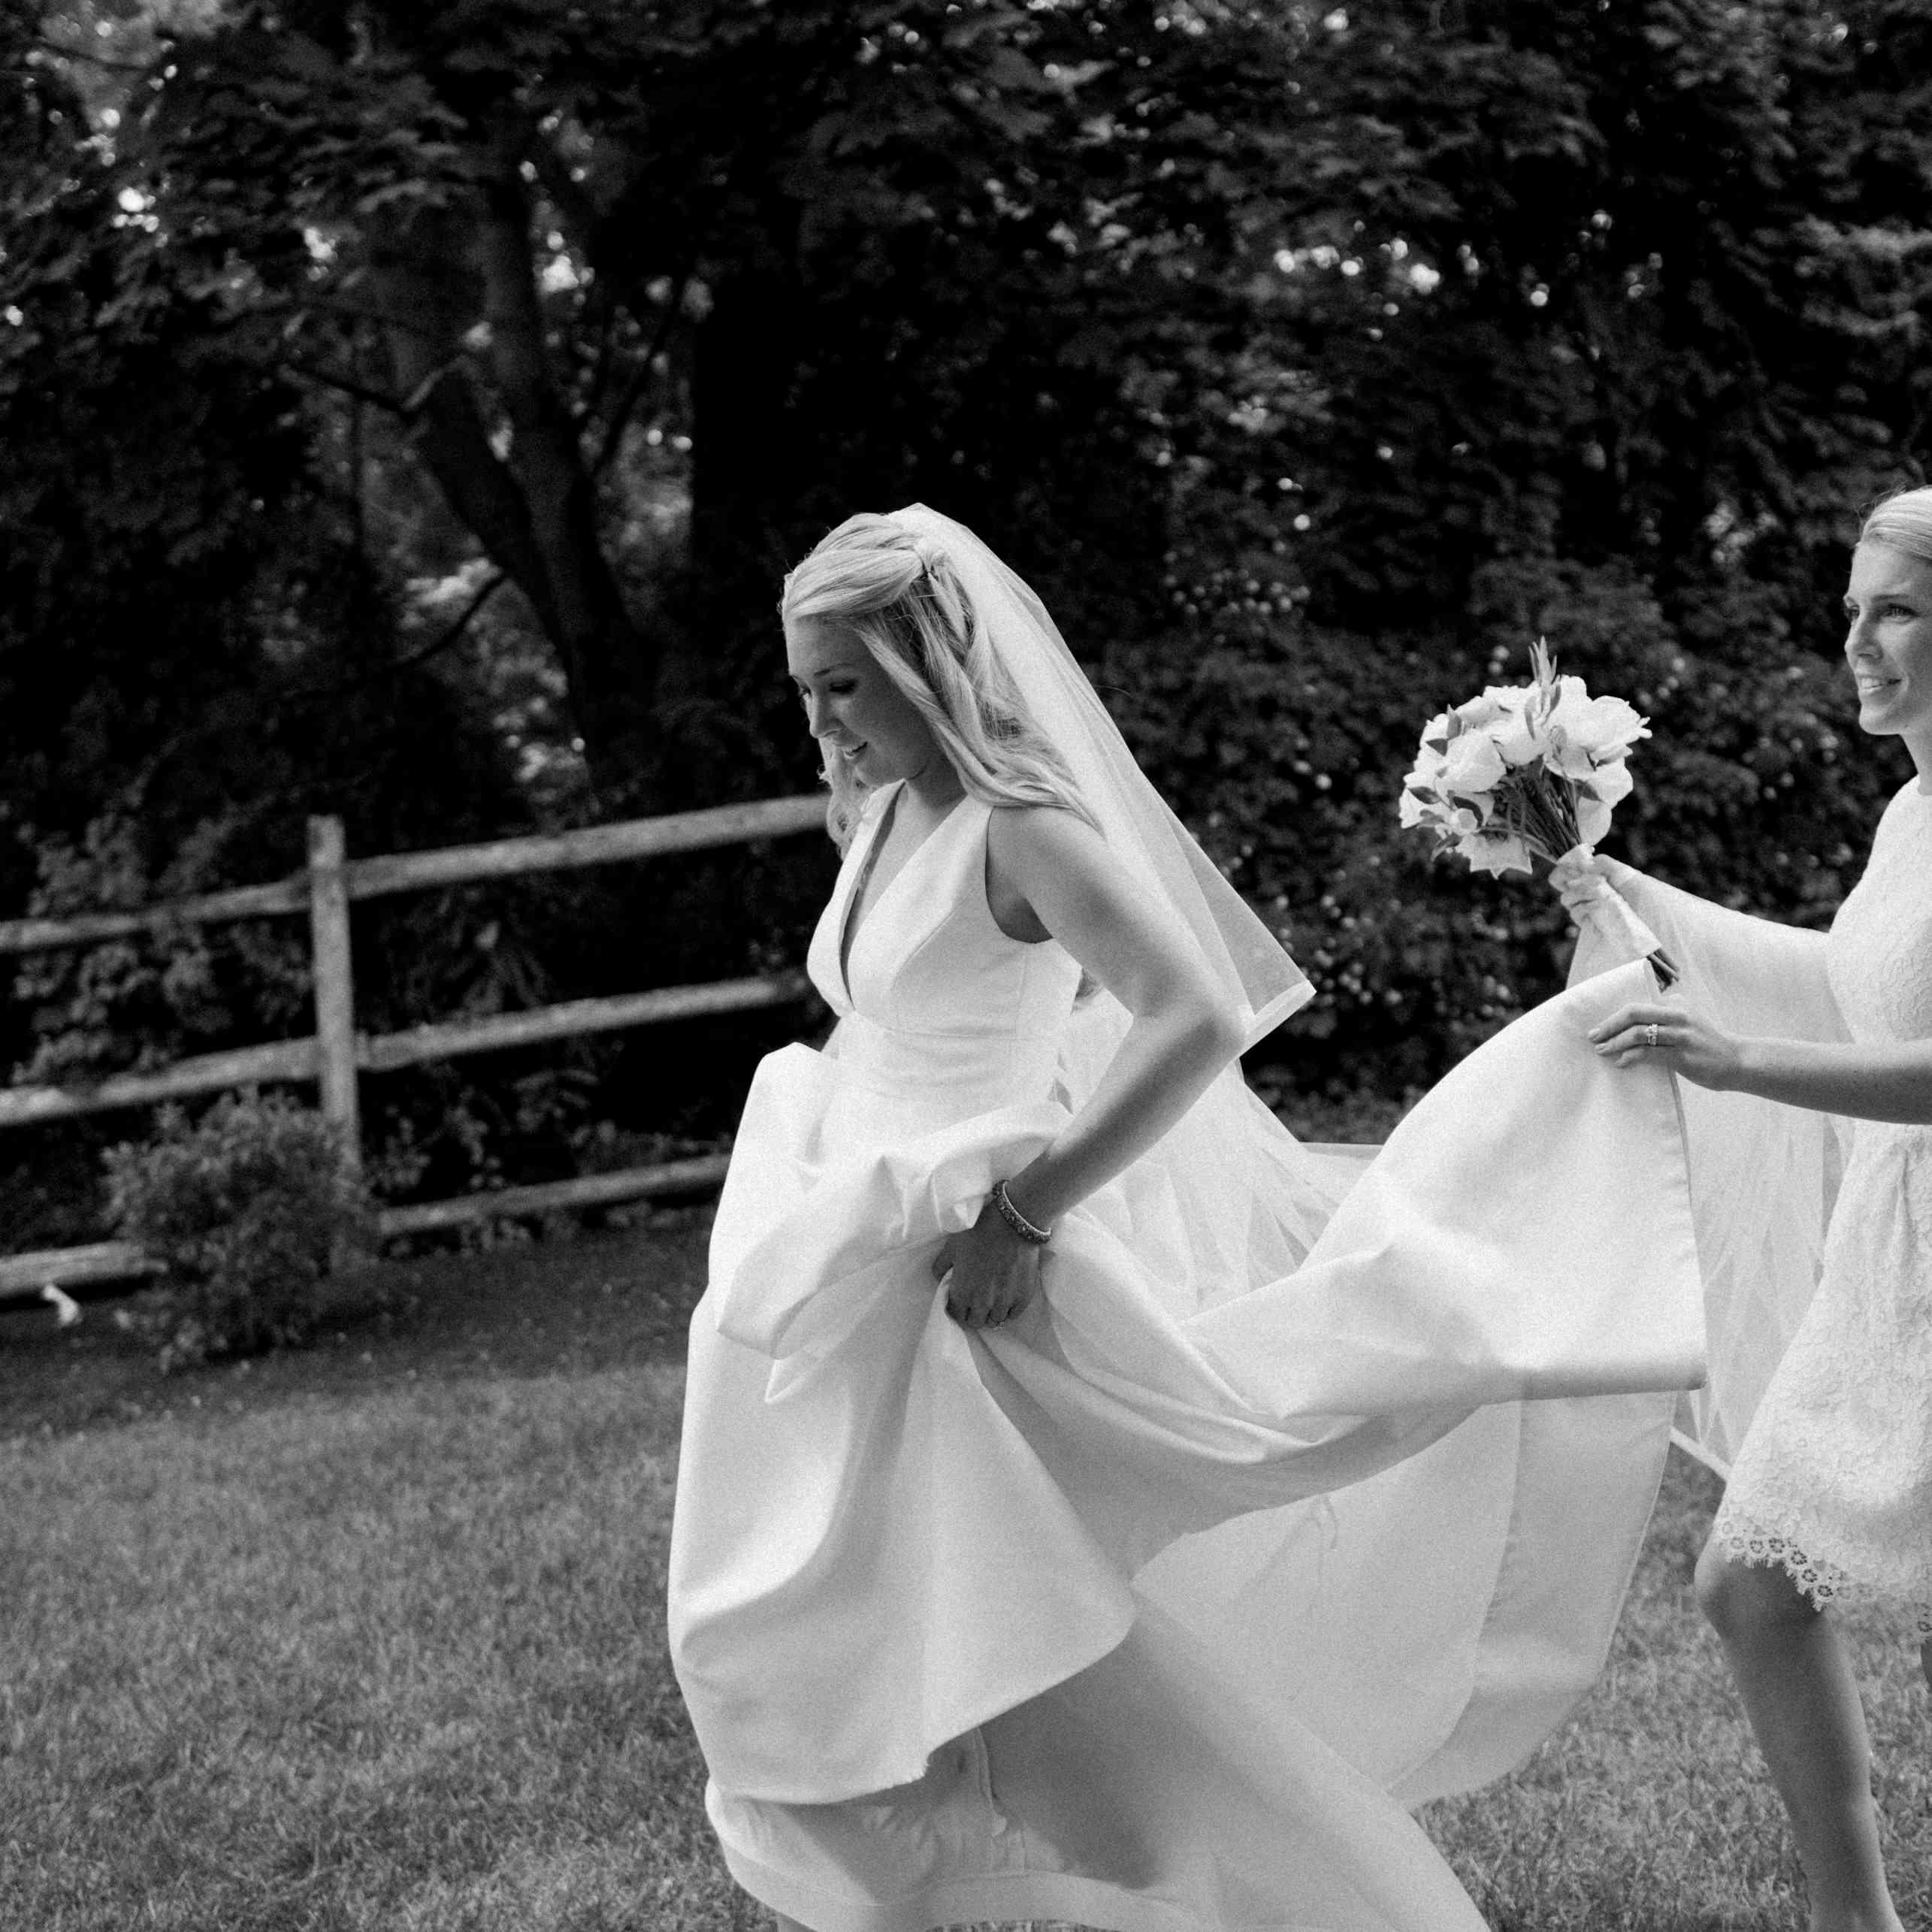 Bridesmaid holding bride's train